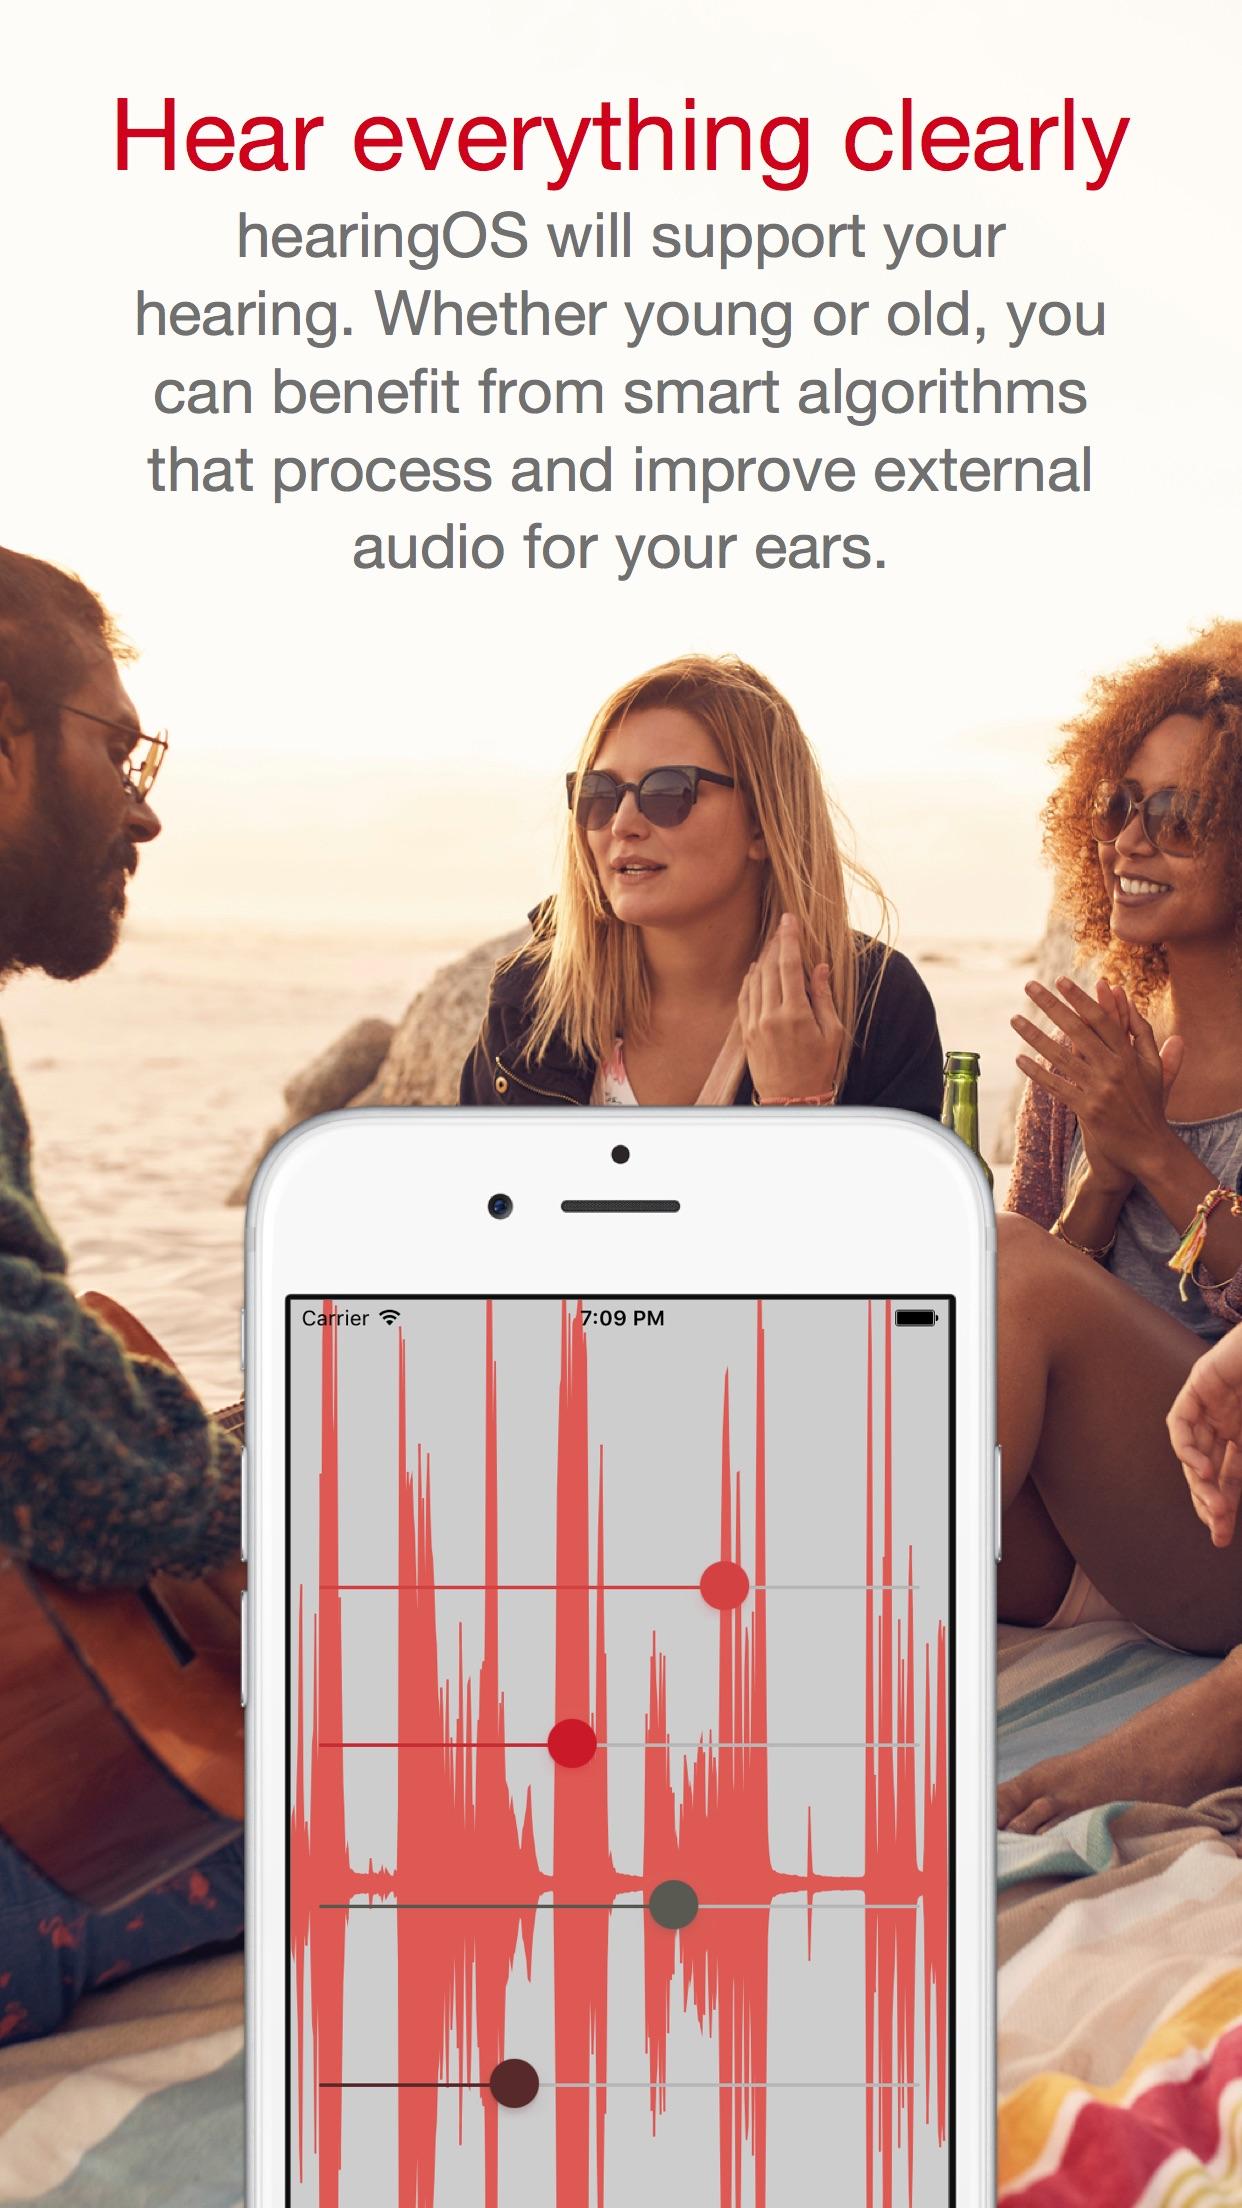 hearingOS - Hearing Aid App Screenshot